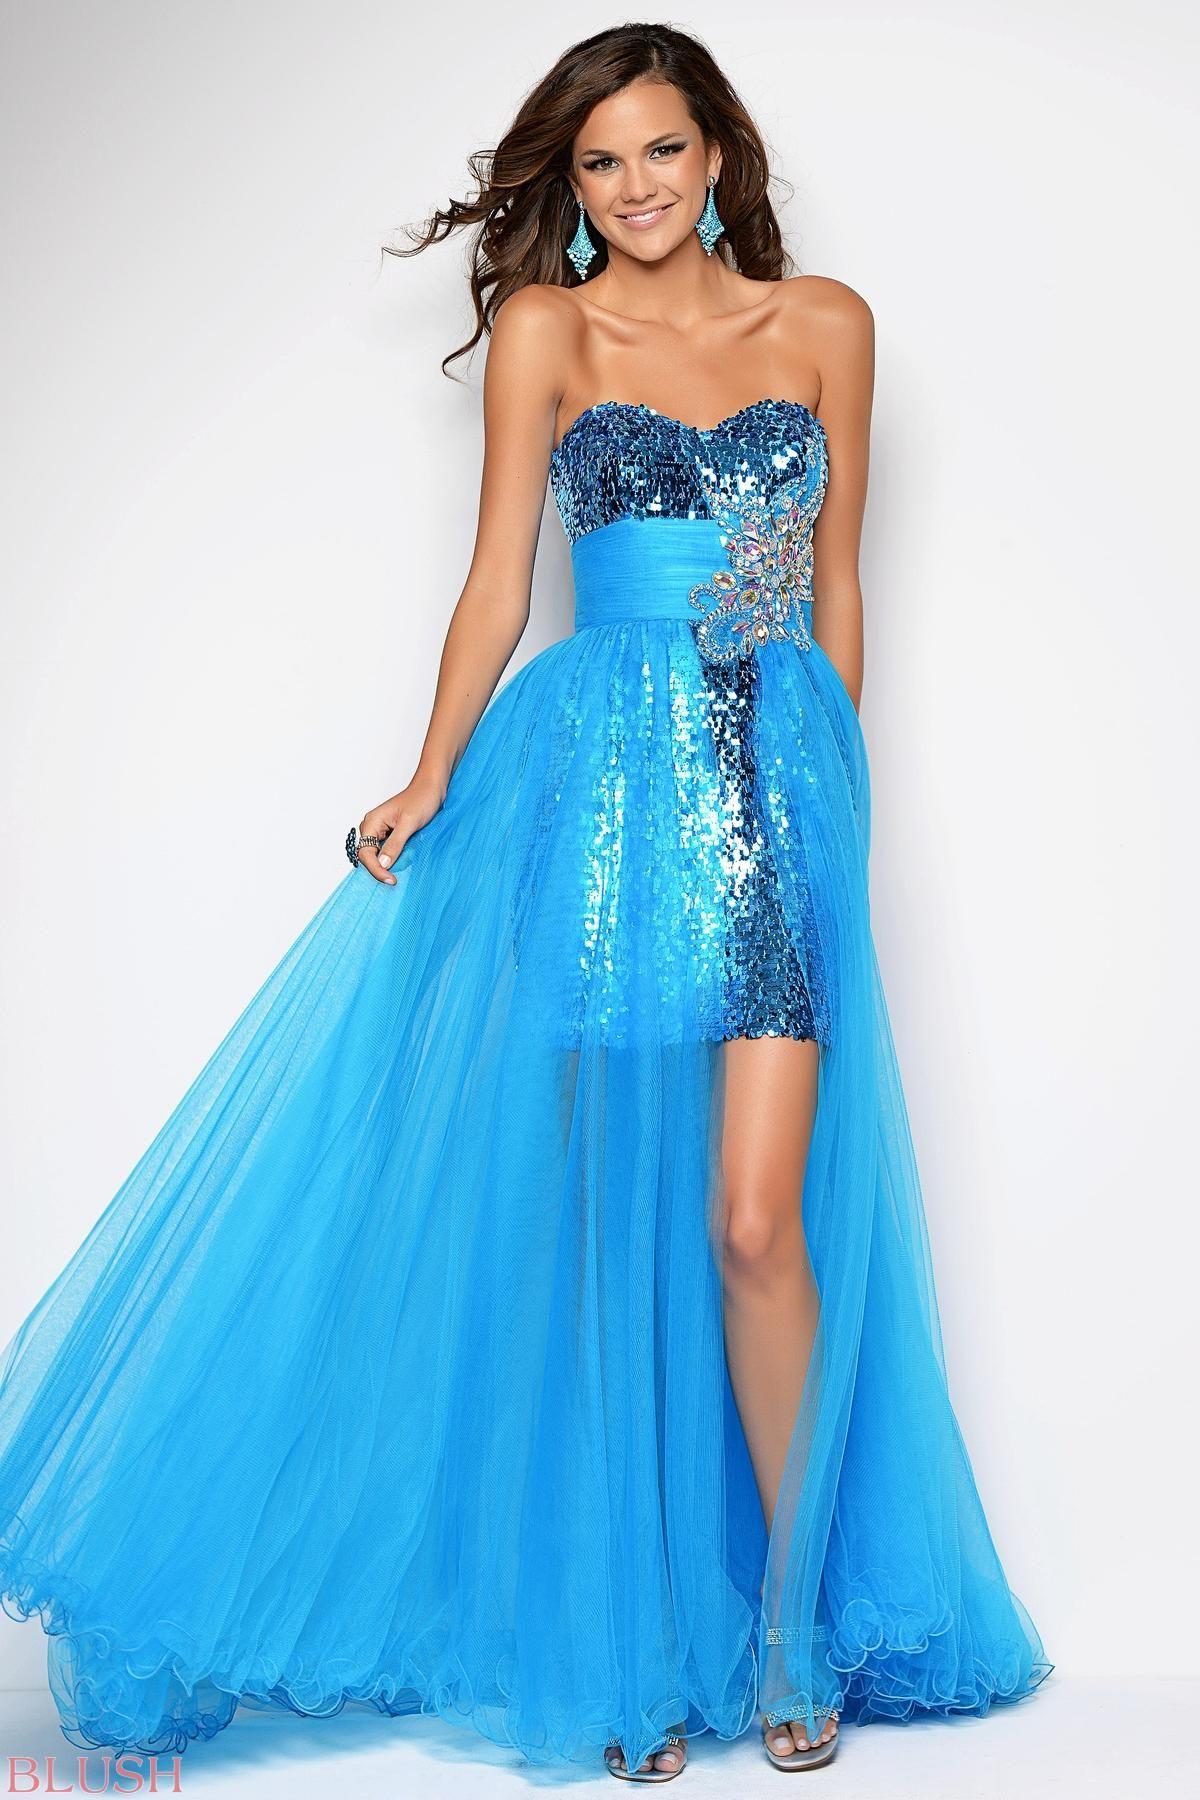 Fine Blush Prom Dresses 2013 Crest - All Wedding Dresses ...